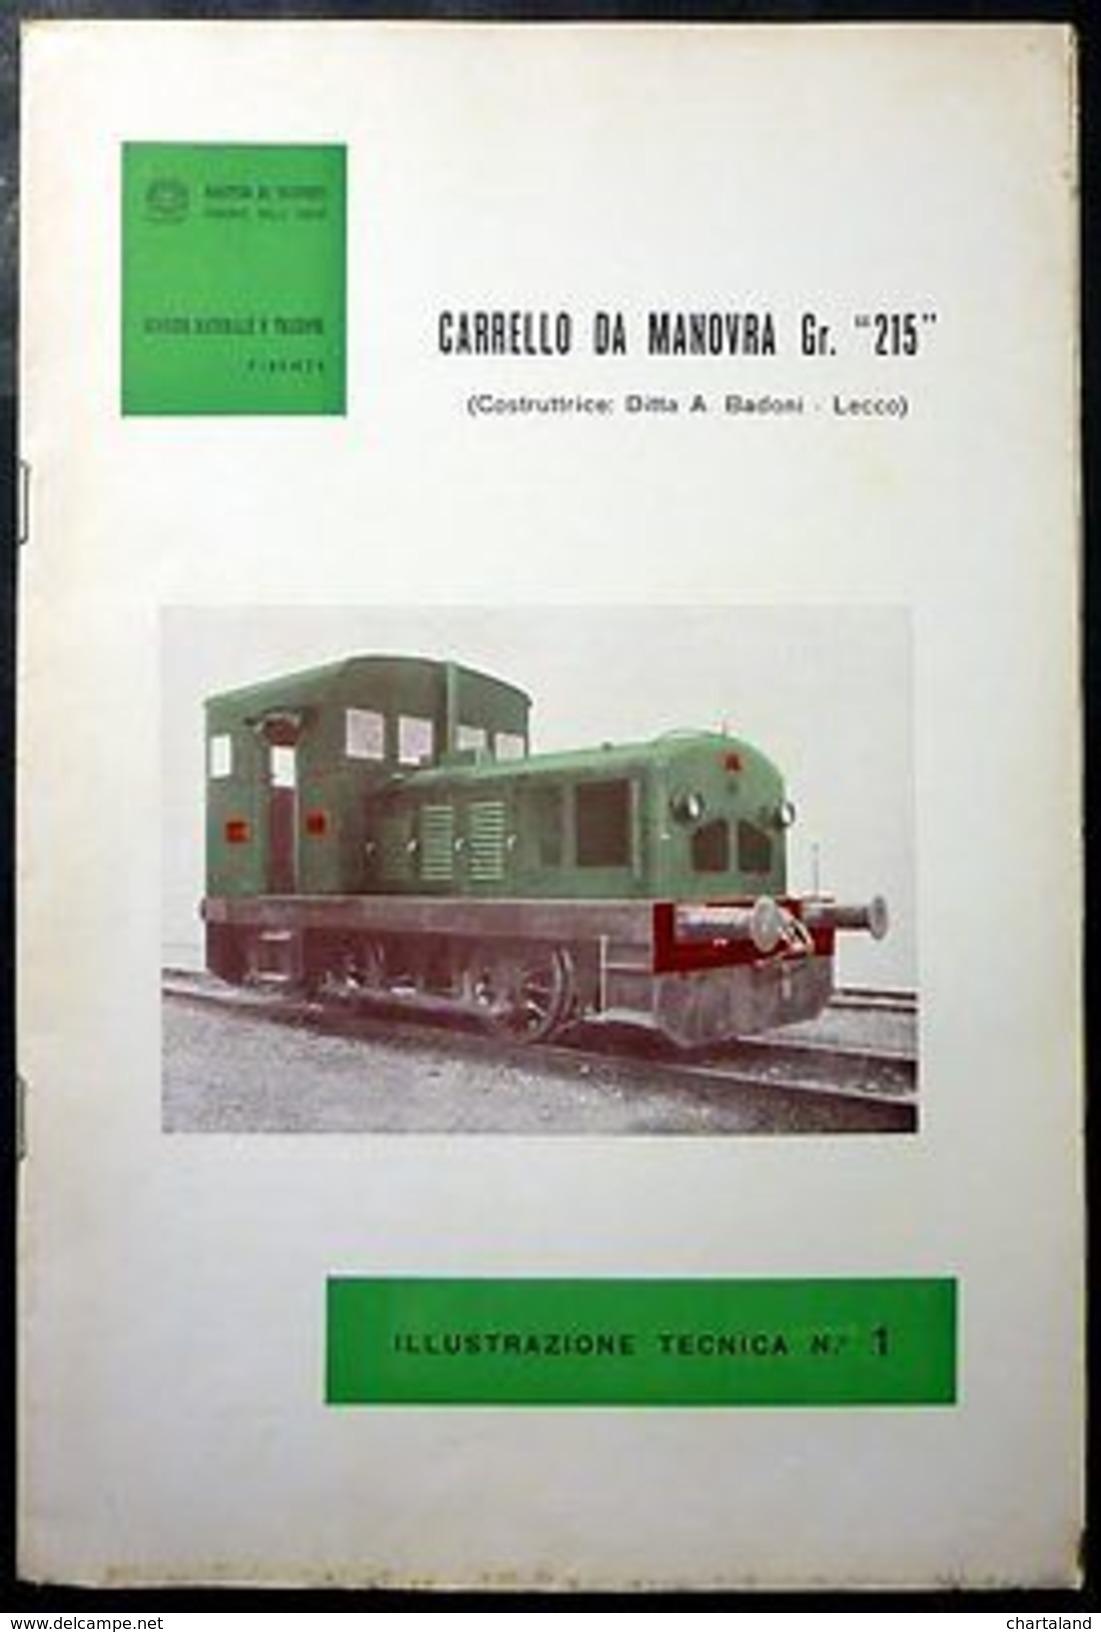 Ferrovie - Brochure Locomotore Carrello Da Manovra Gr. 215 - Ditta Badoni - 1962 - Unclassified